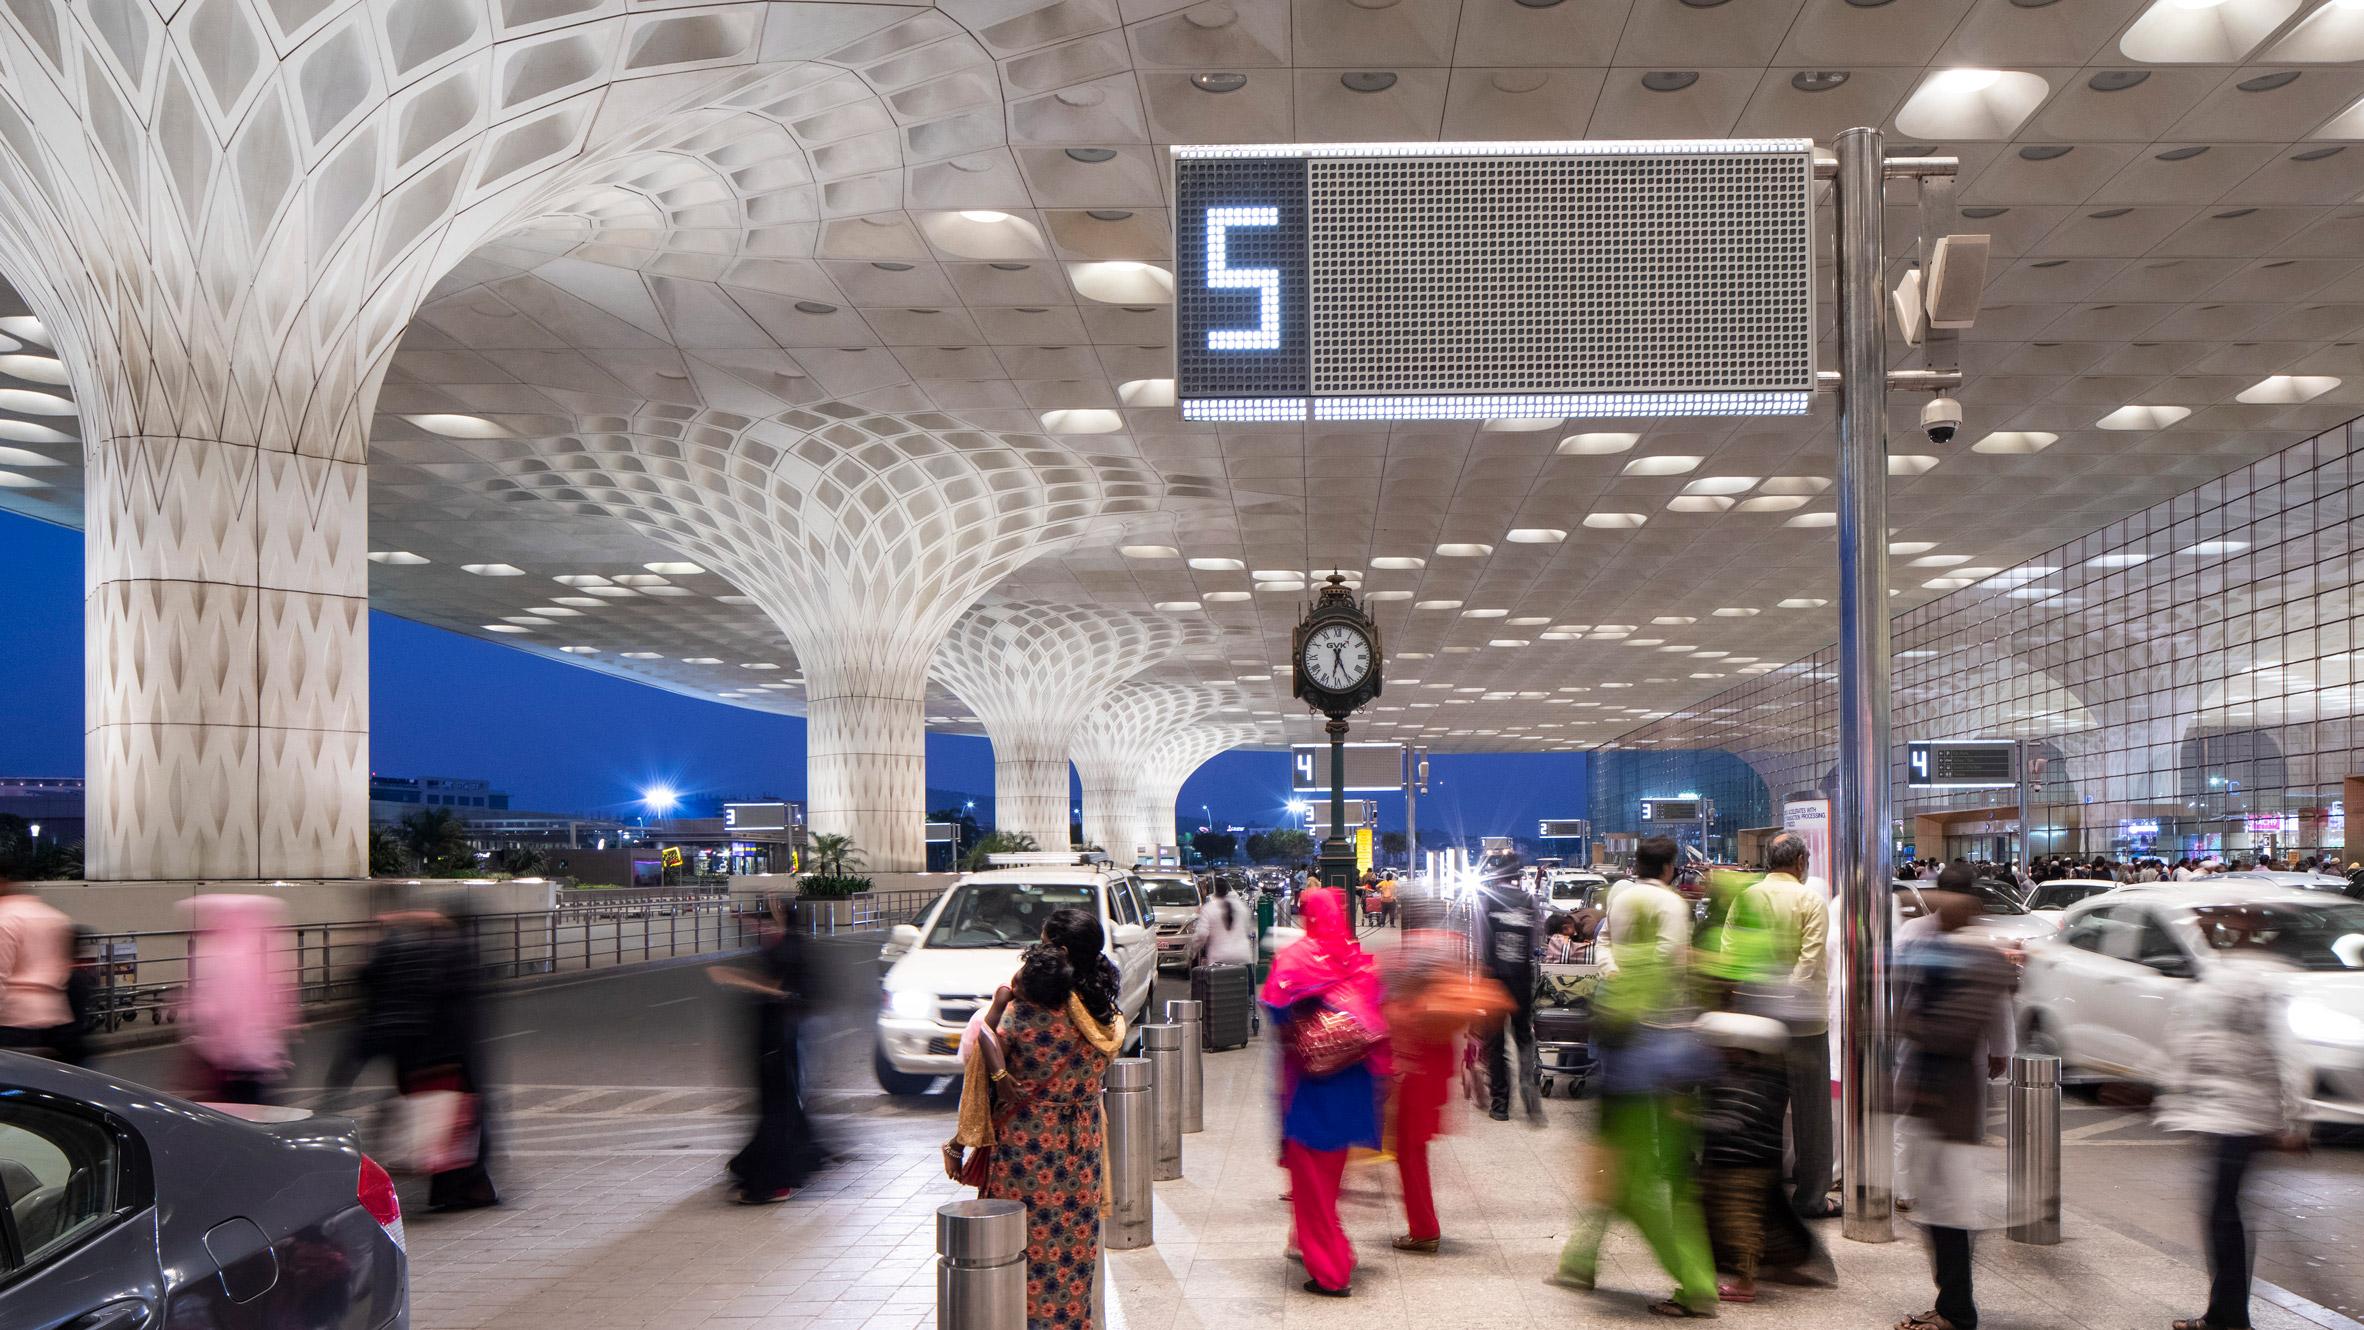 Chhatrapati Shivaji International Airport Terminal 2 by SOM